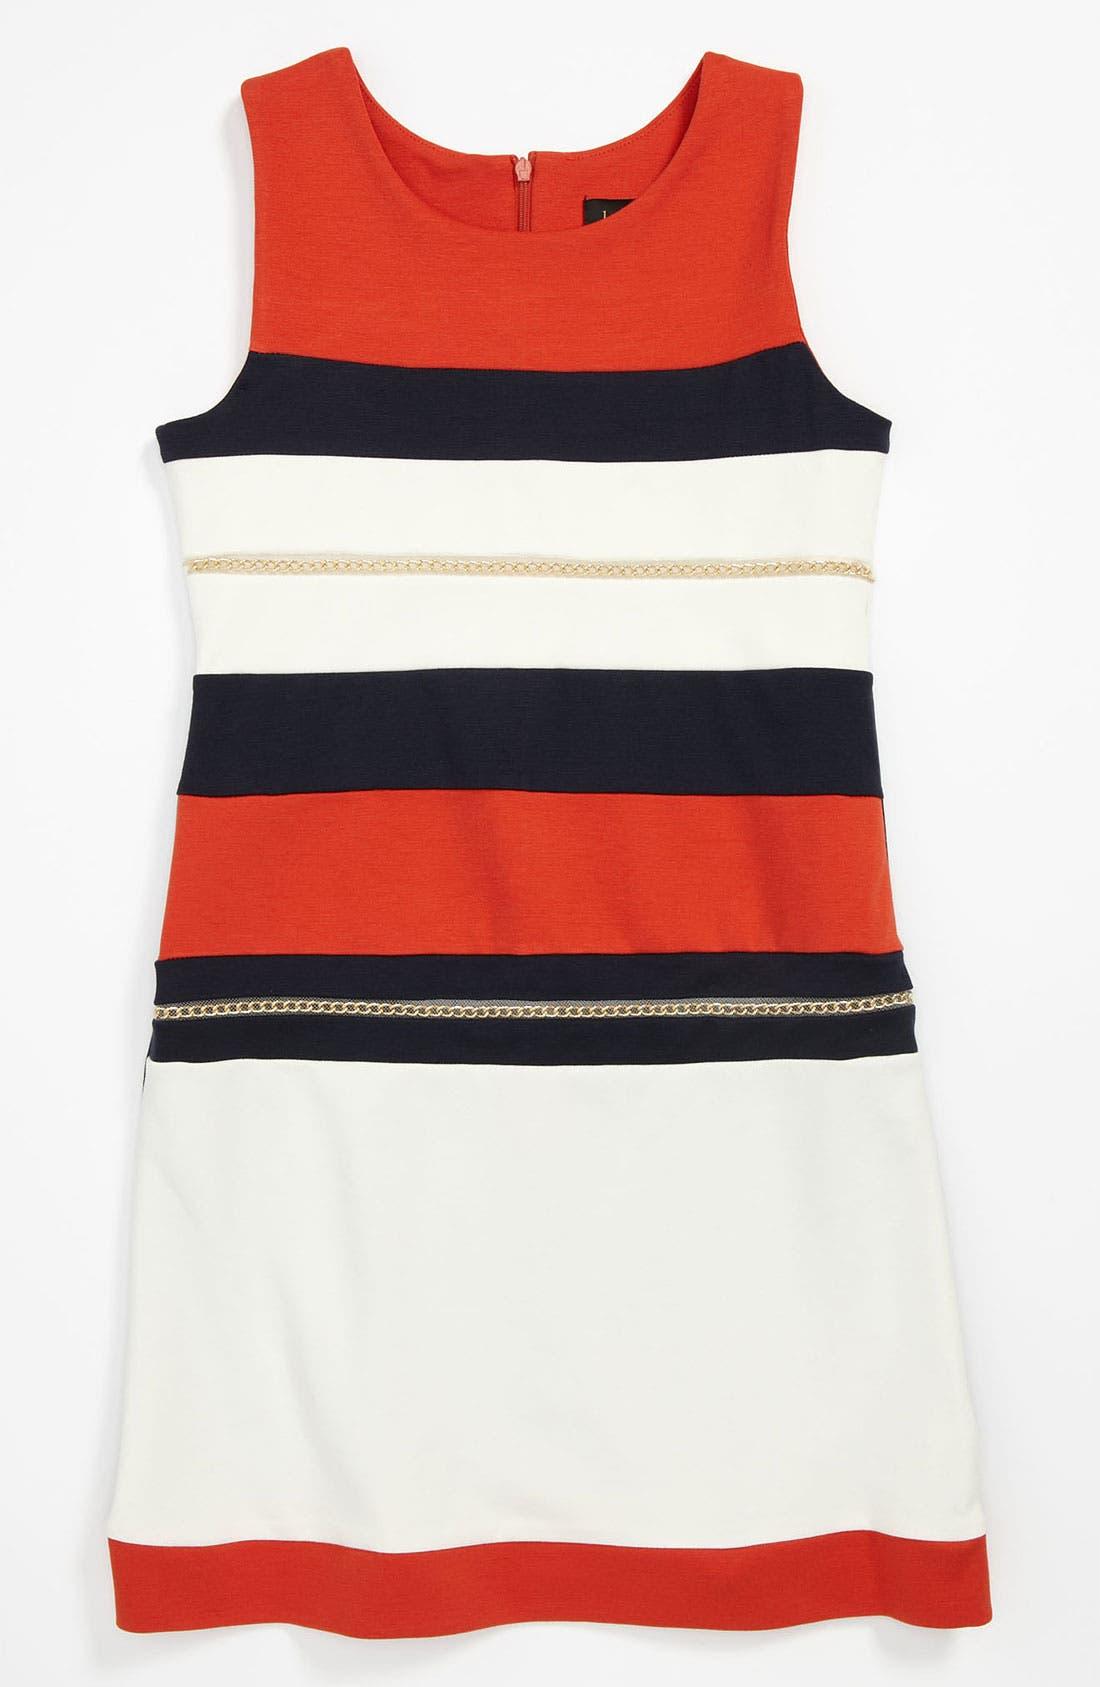 Main Image - Laundry by Shelli Segal 'Veronica' Dress (Big Girls)